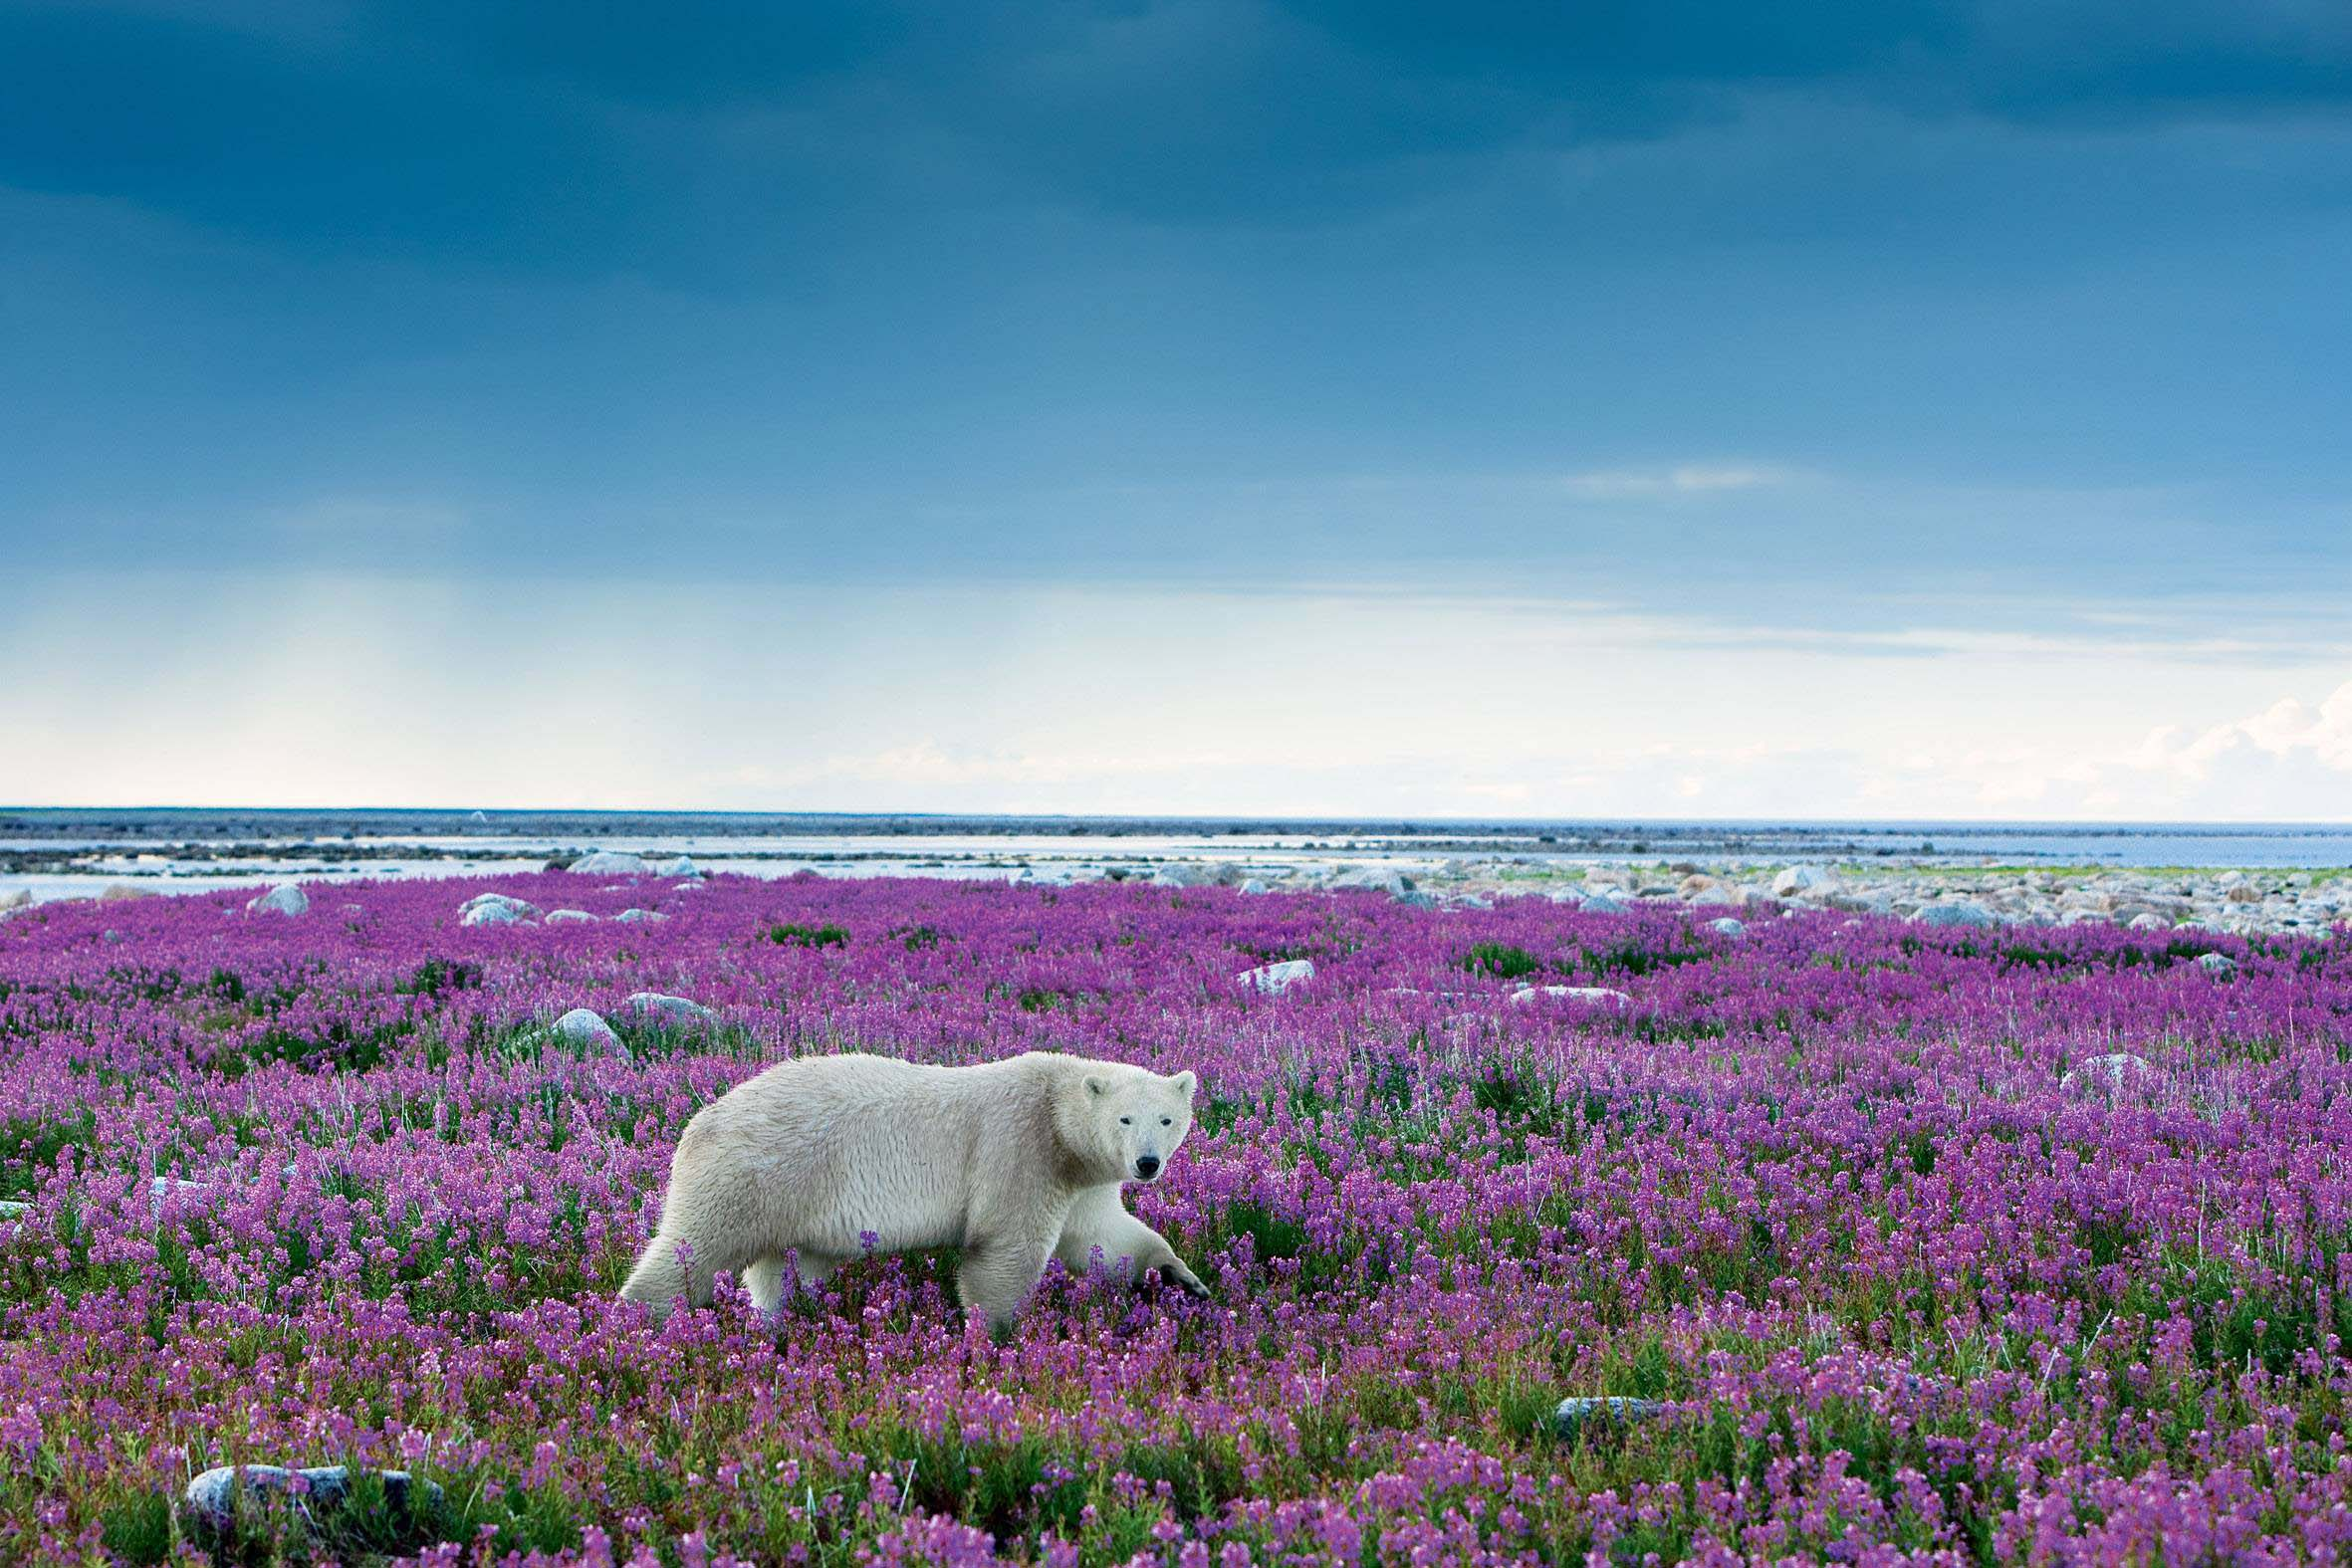 stunning-white-bears-among-the-many-flowersfull-hd-wallpaper